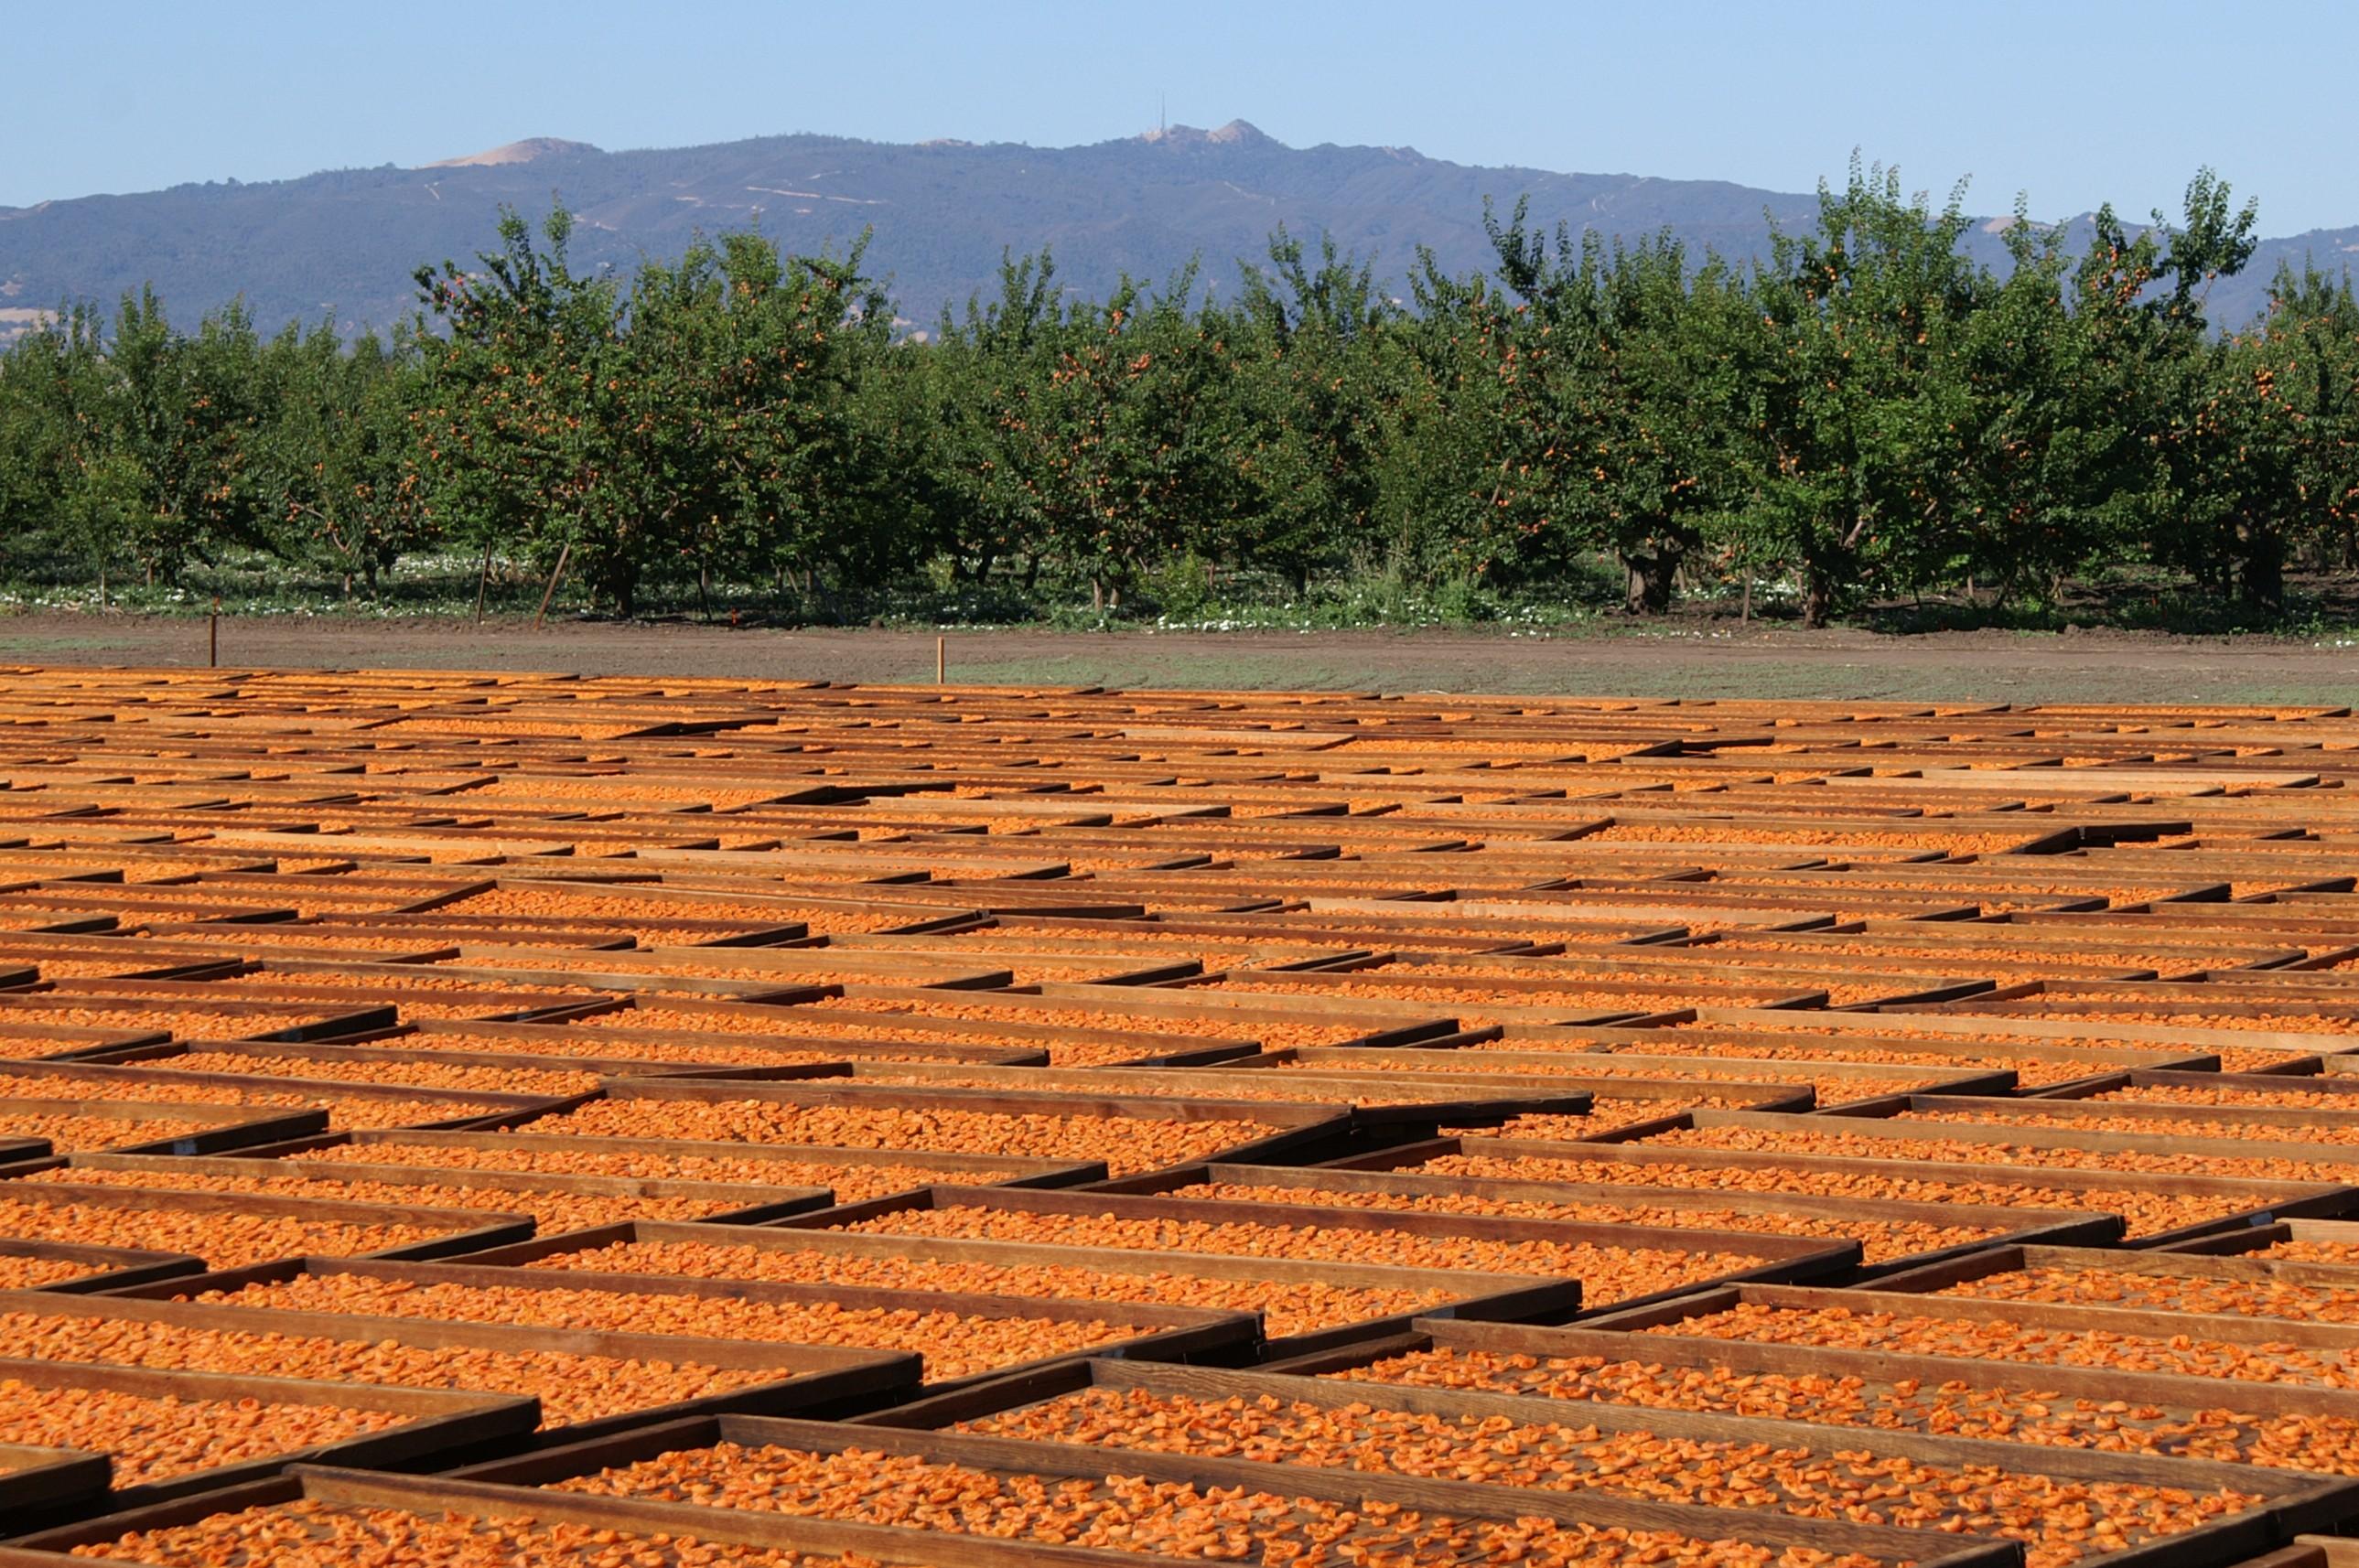 dry-yard-orchard-fremont-peak.jpg